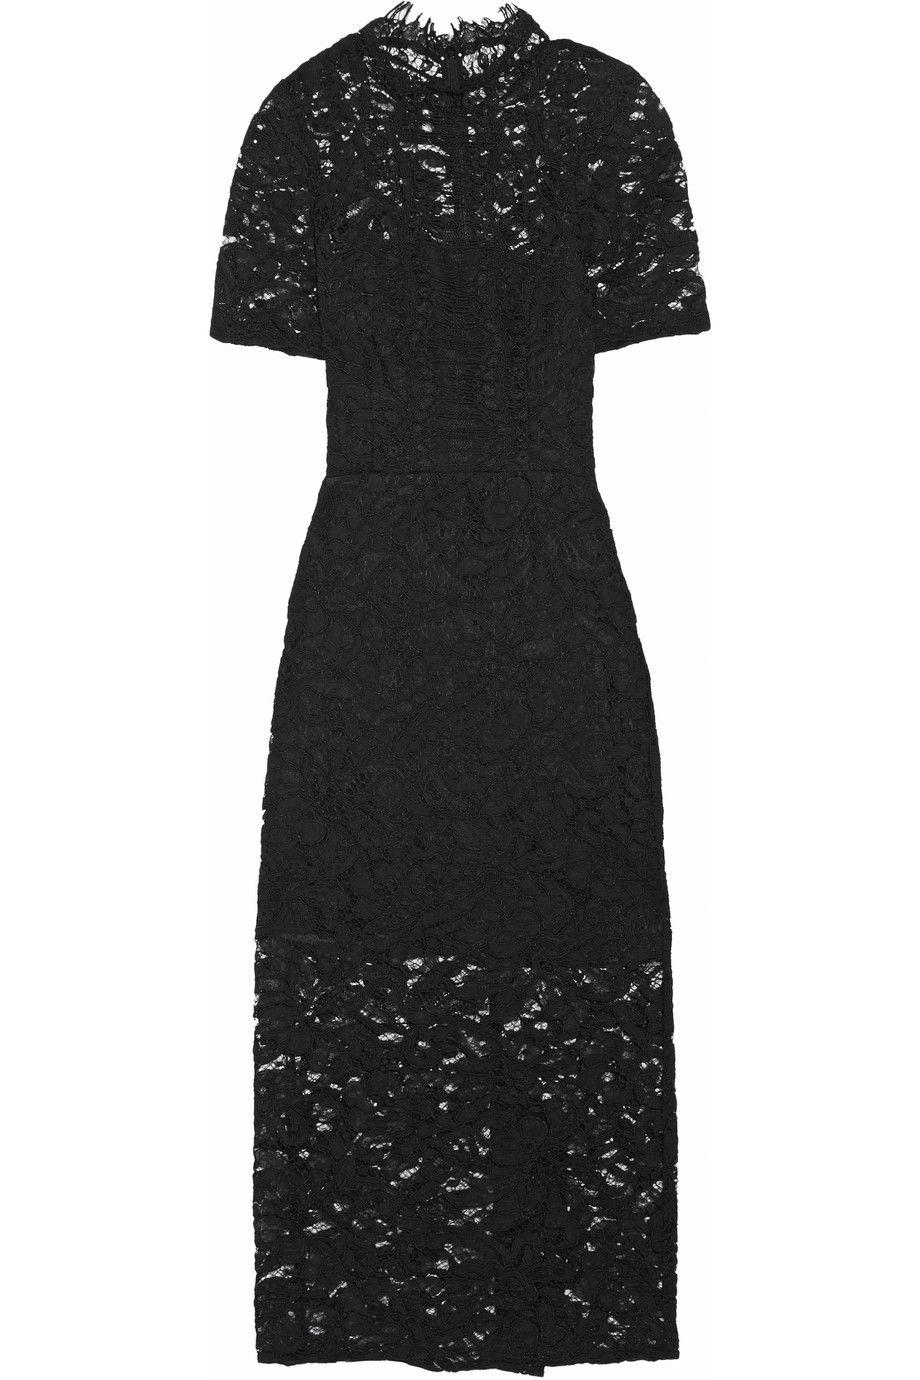 Shop on-sale Alexis Delila lace dress. Browse other discount ...